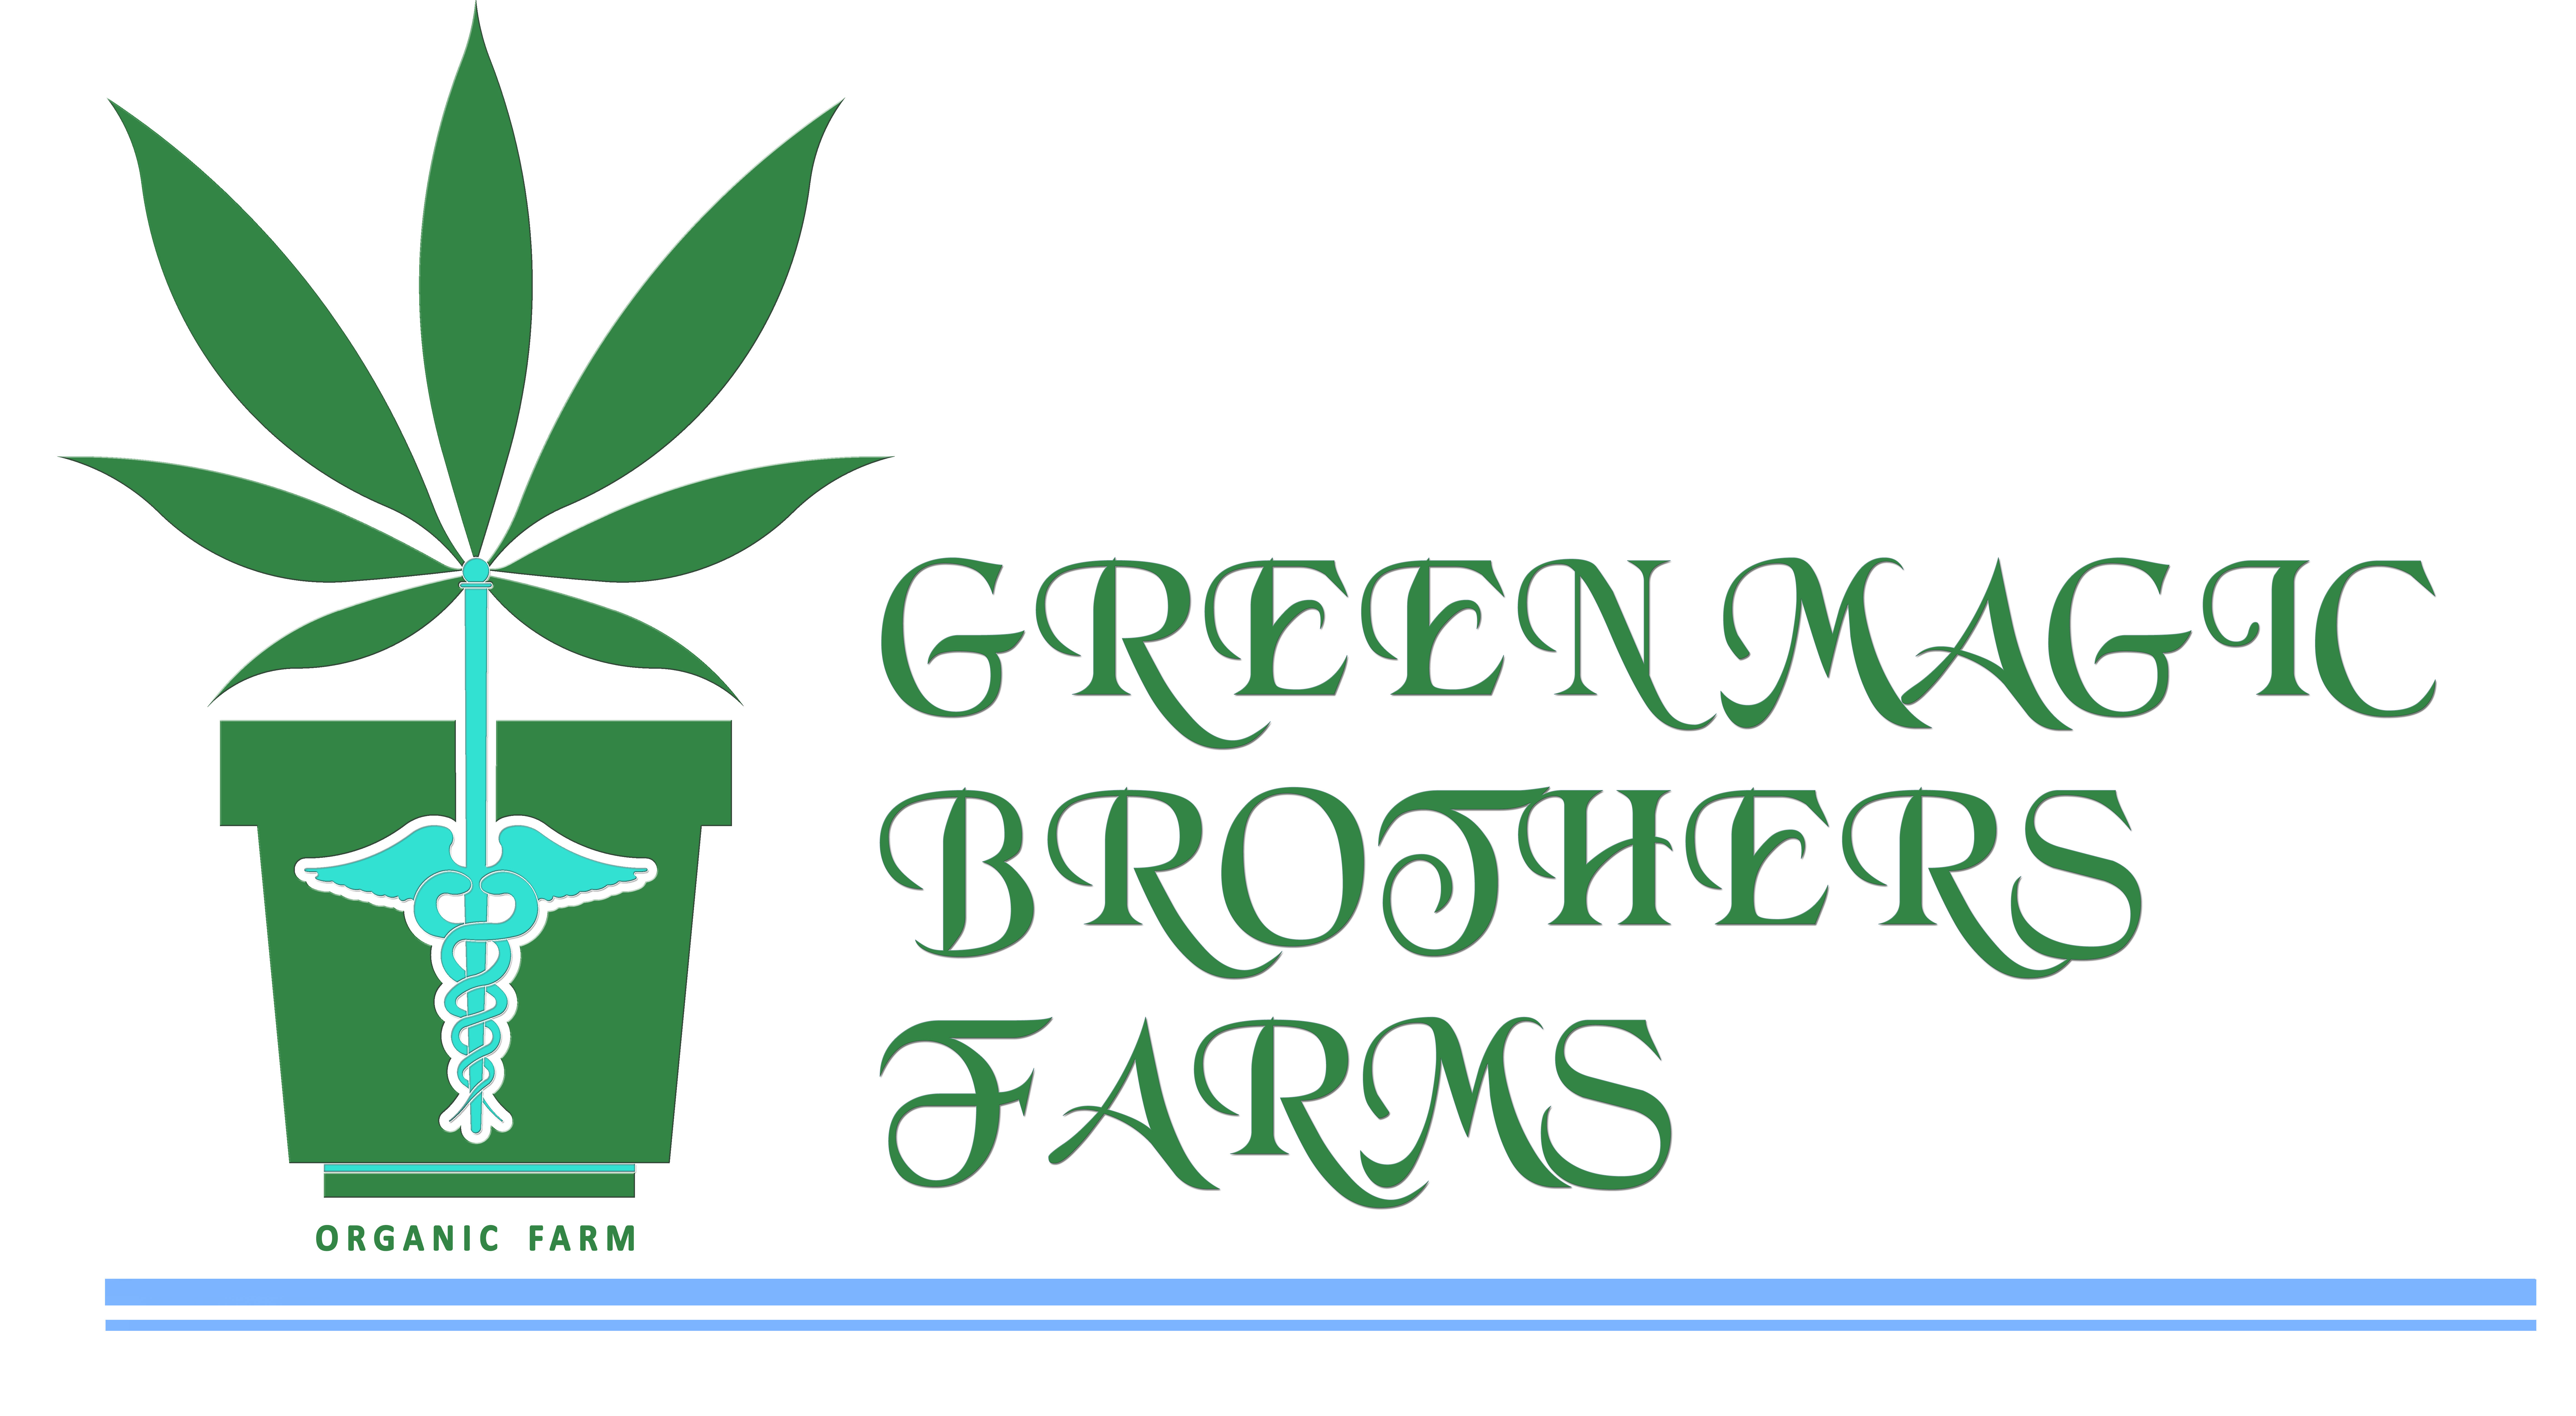 Logo Design by Dn.ArtAndDesign - Entry No. 76 in the Logo Design Contest Green Brothers Farm Logo Design.